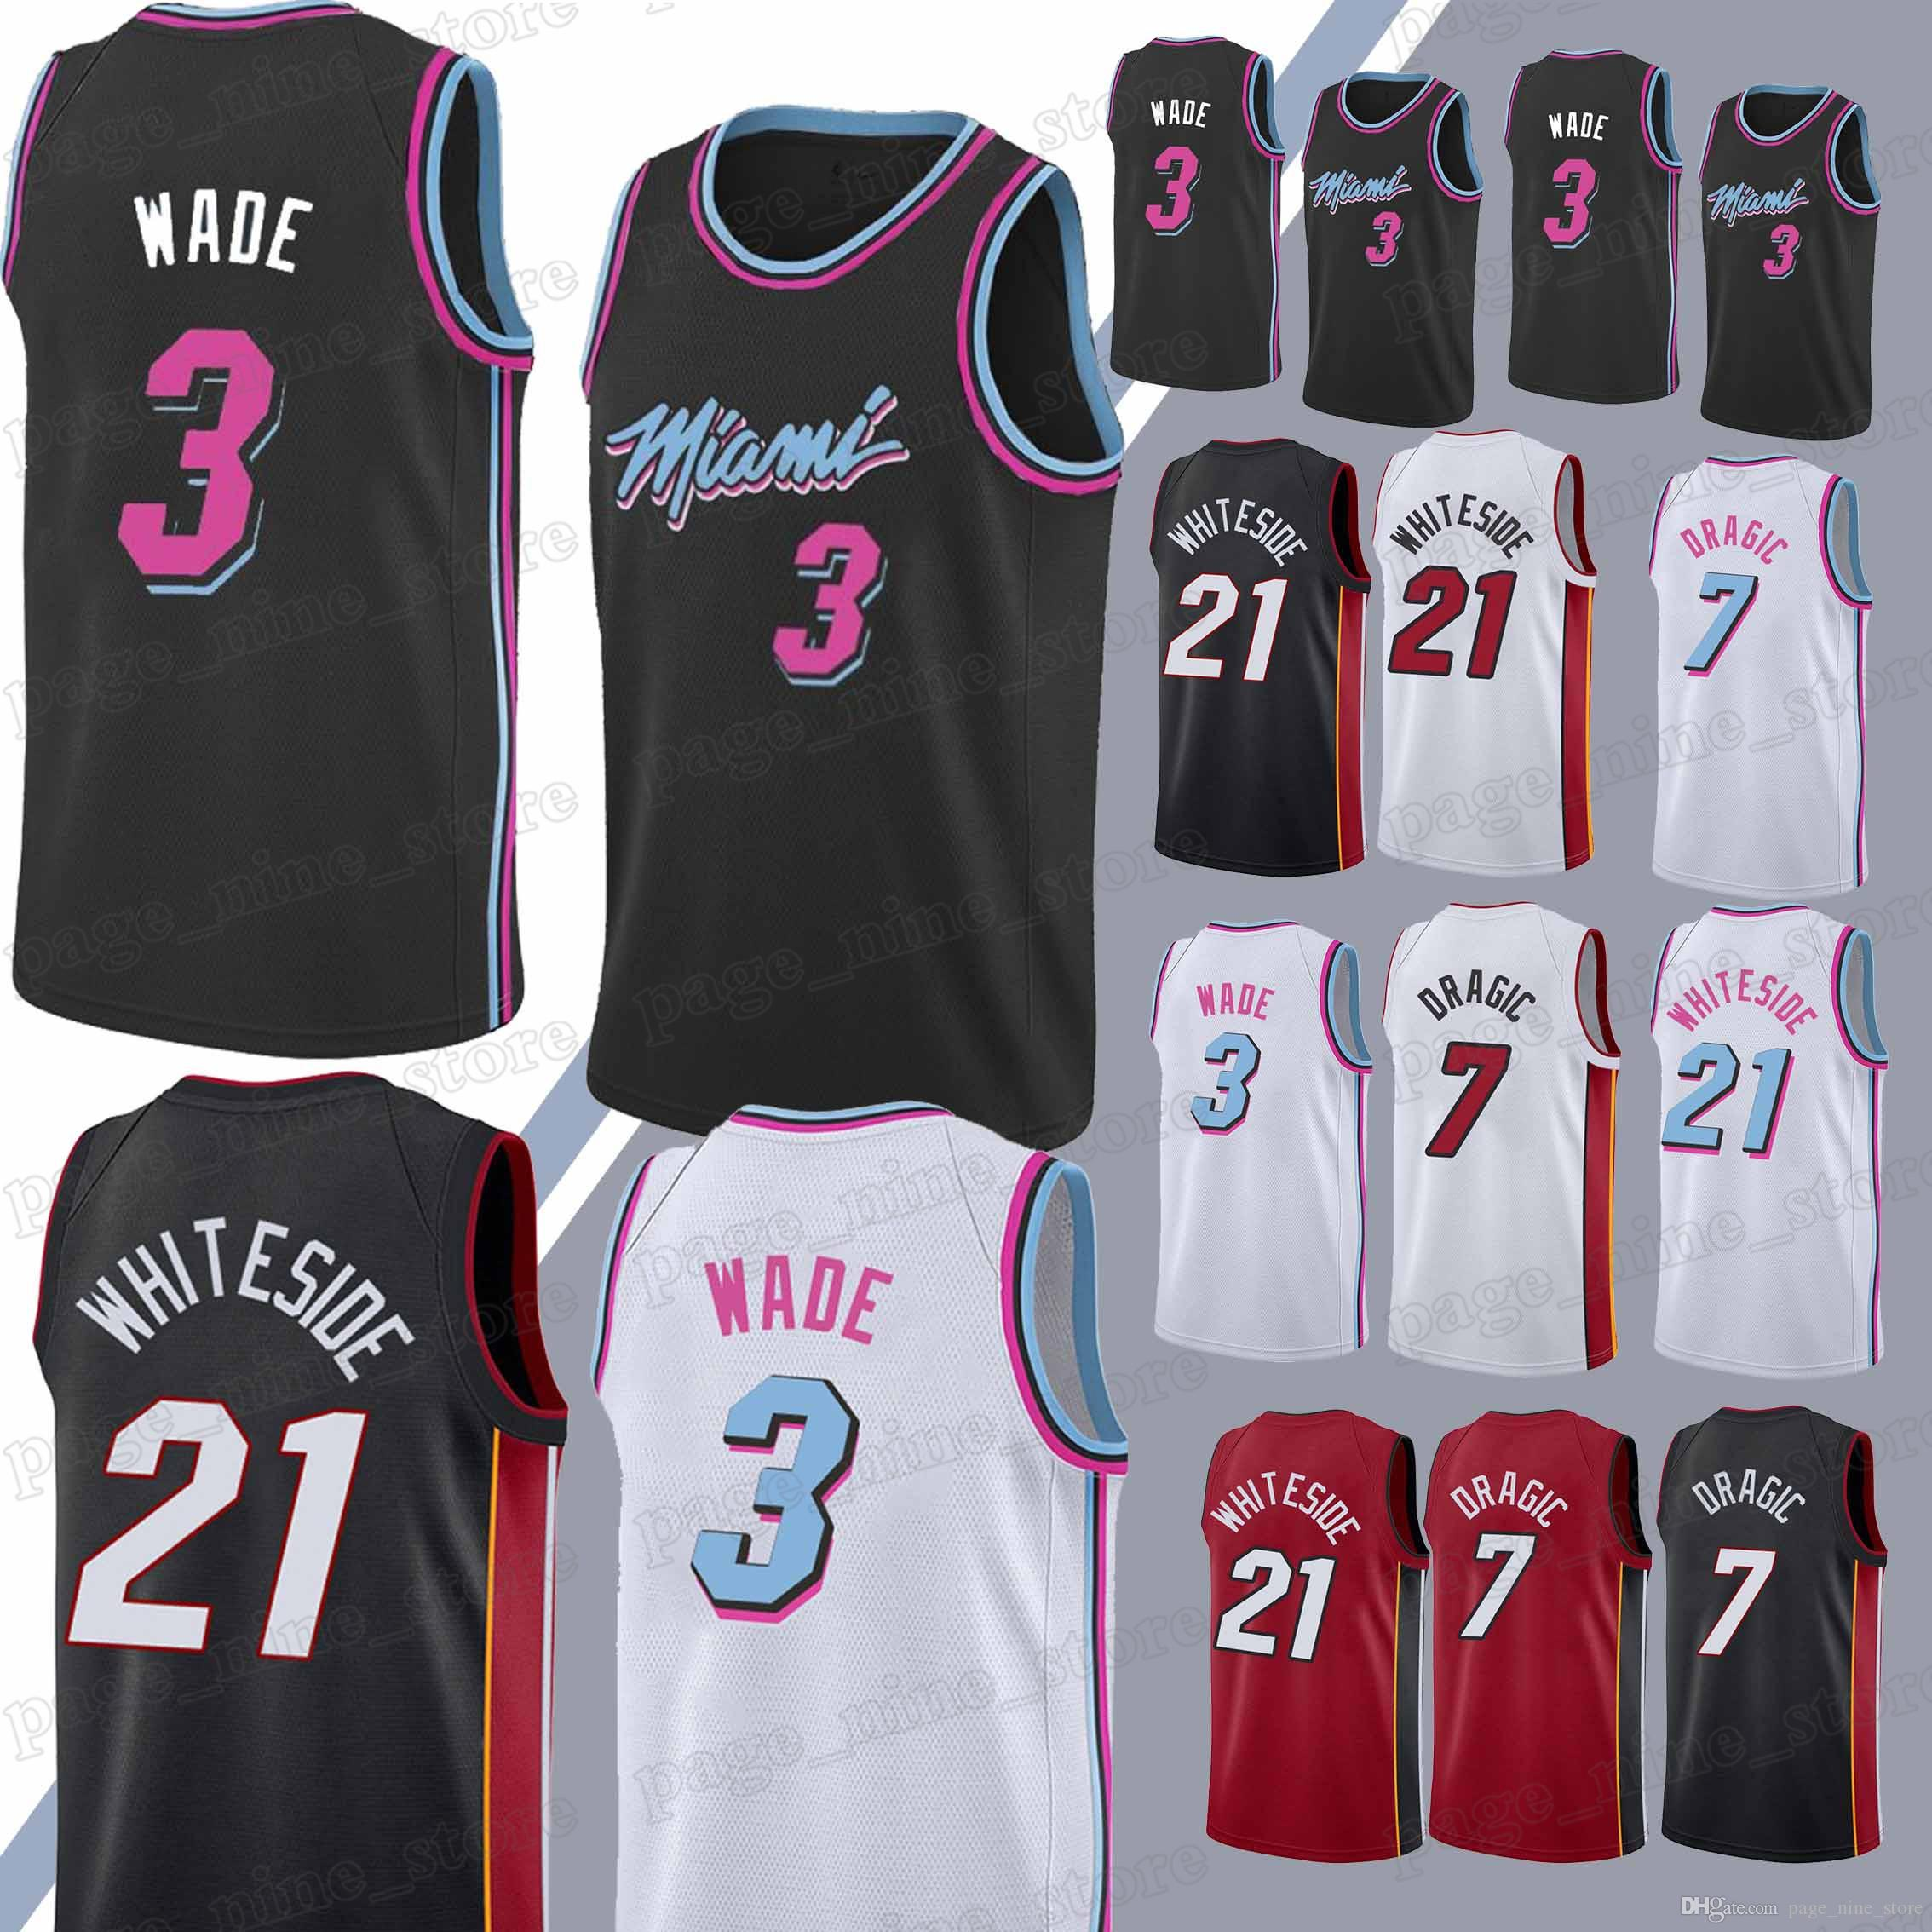 087a2bc8a2a ... best price miami heat jerseys 7 goran dragic 3 dwyane wade 21 hassan  whiteside hot sale ...